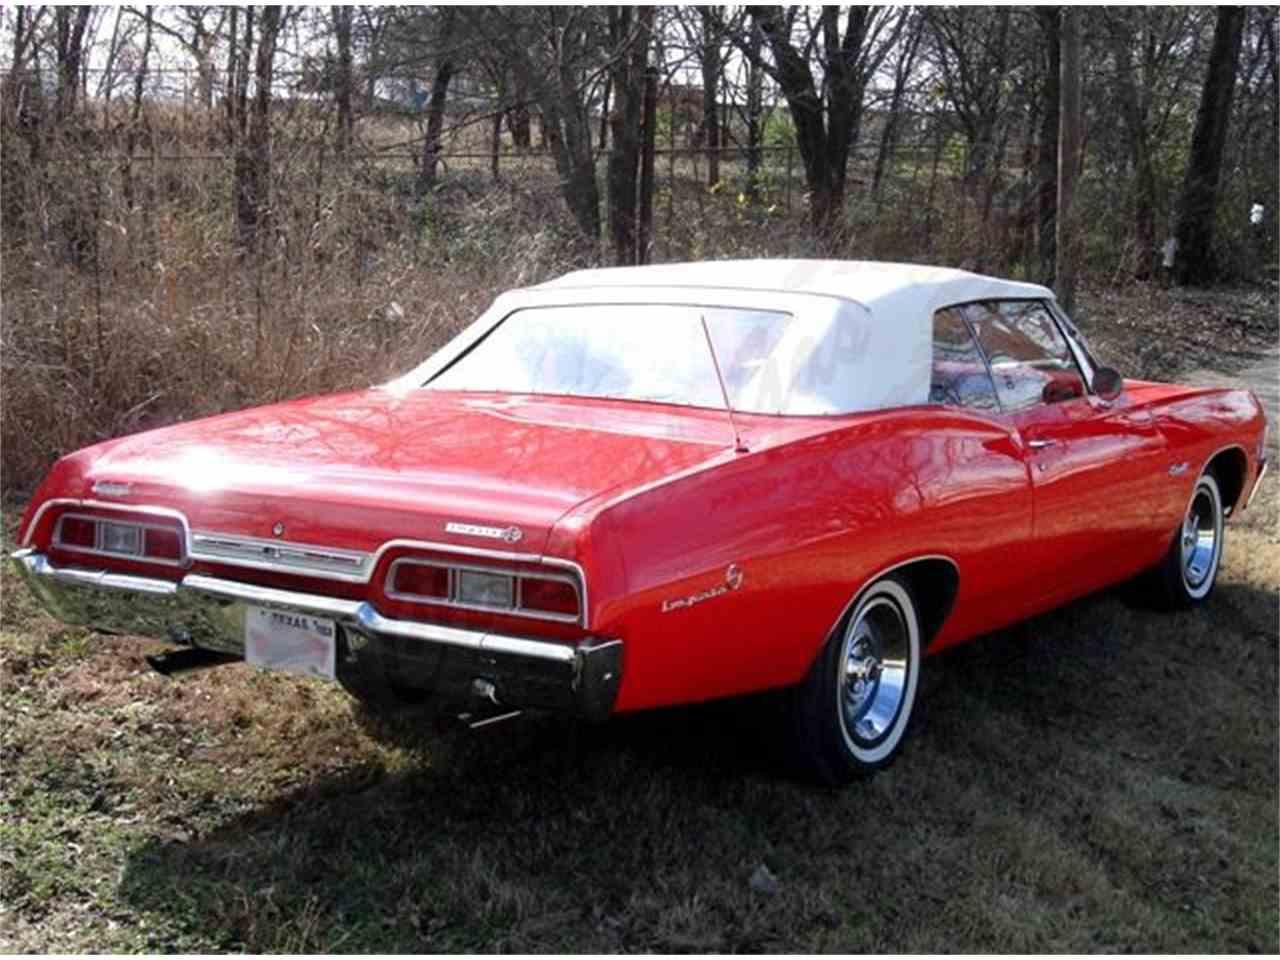 1967 chevrolet impala ss for sale cc 434710. Black Bedroom Furniture Sets. Home Design Ideas